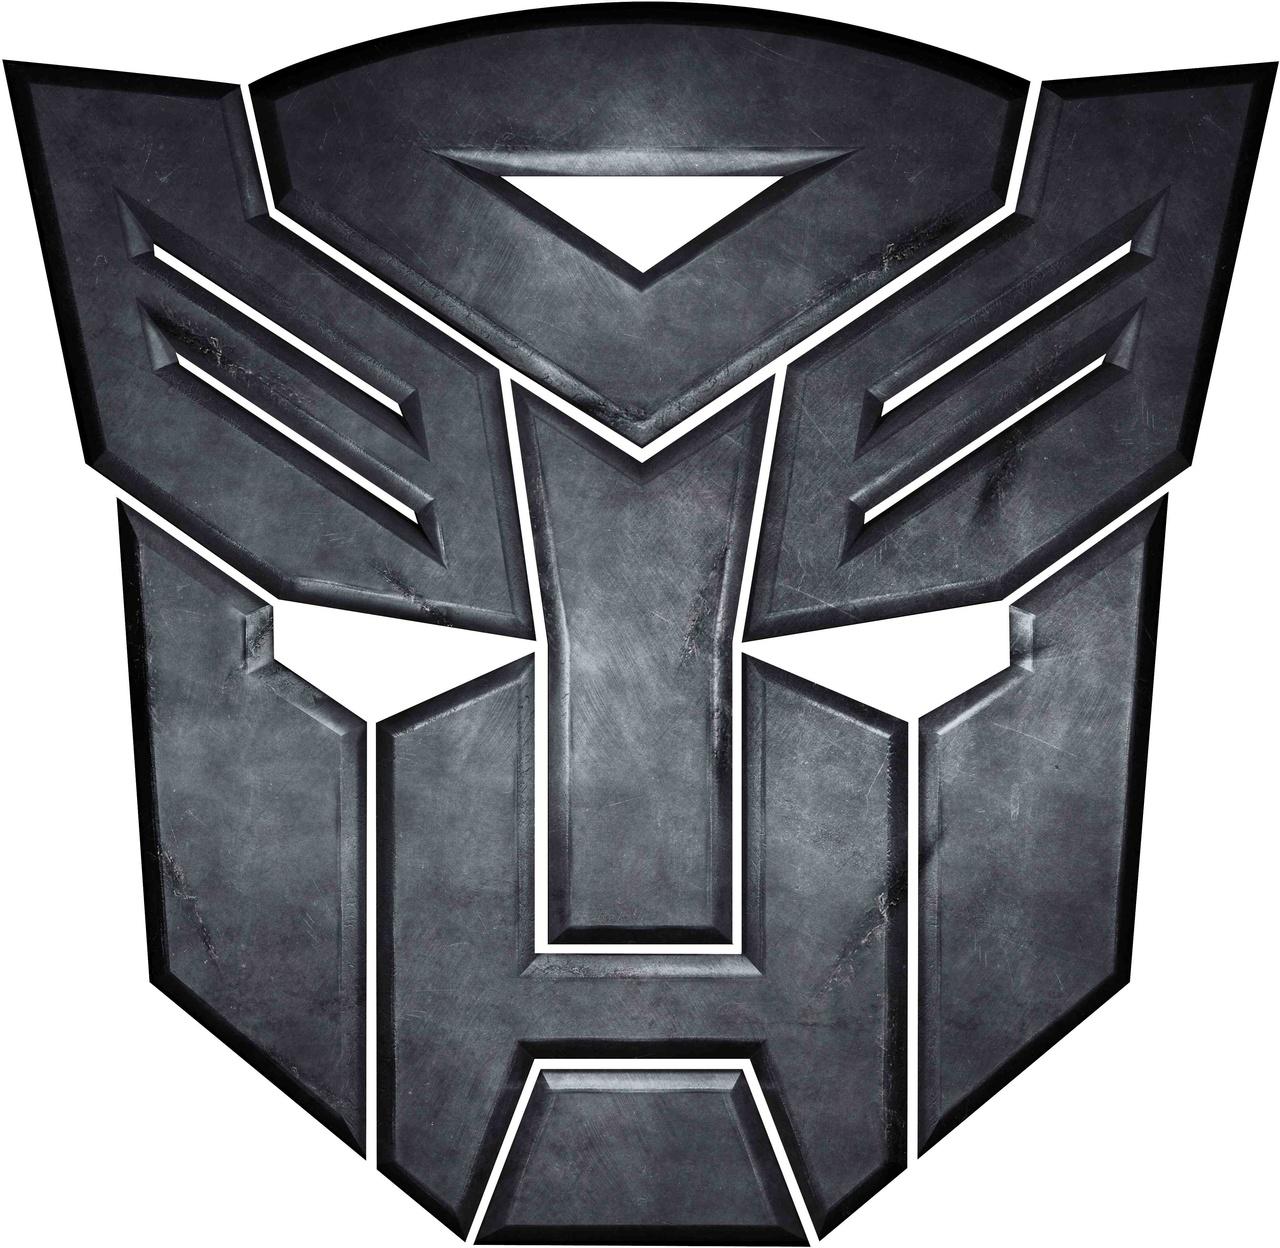 autobots-logo-06